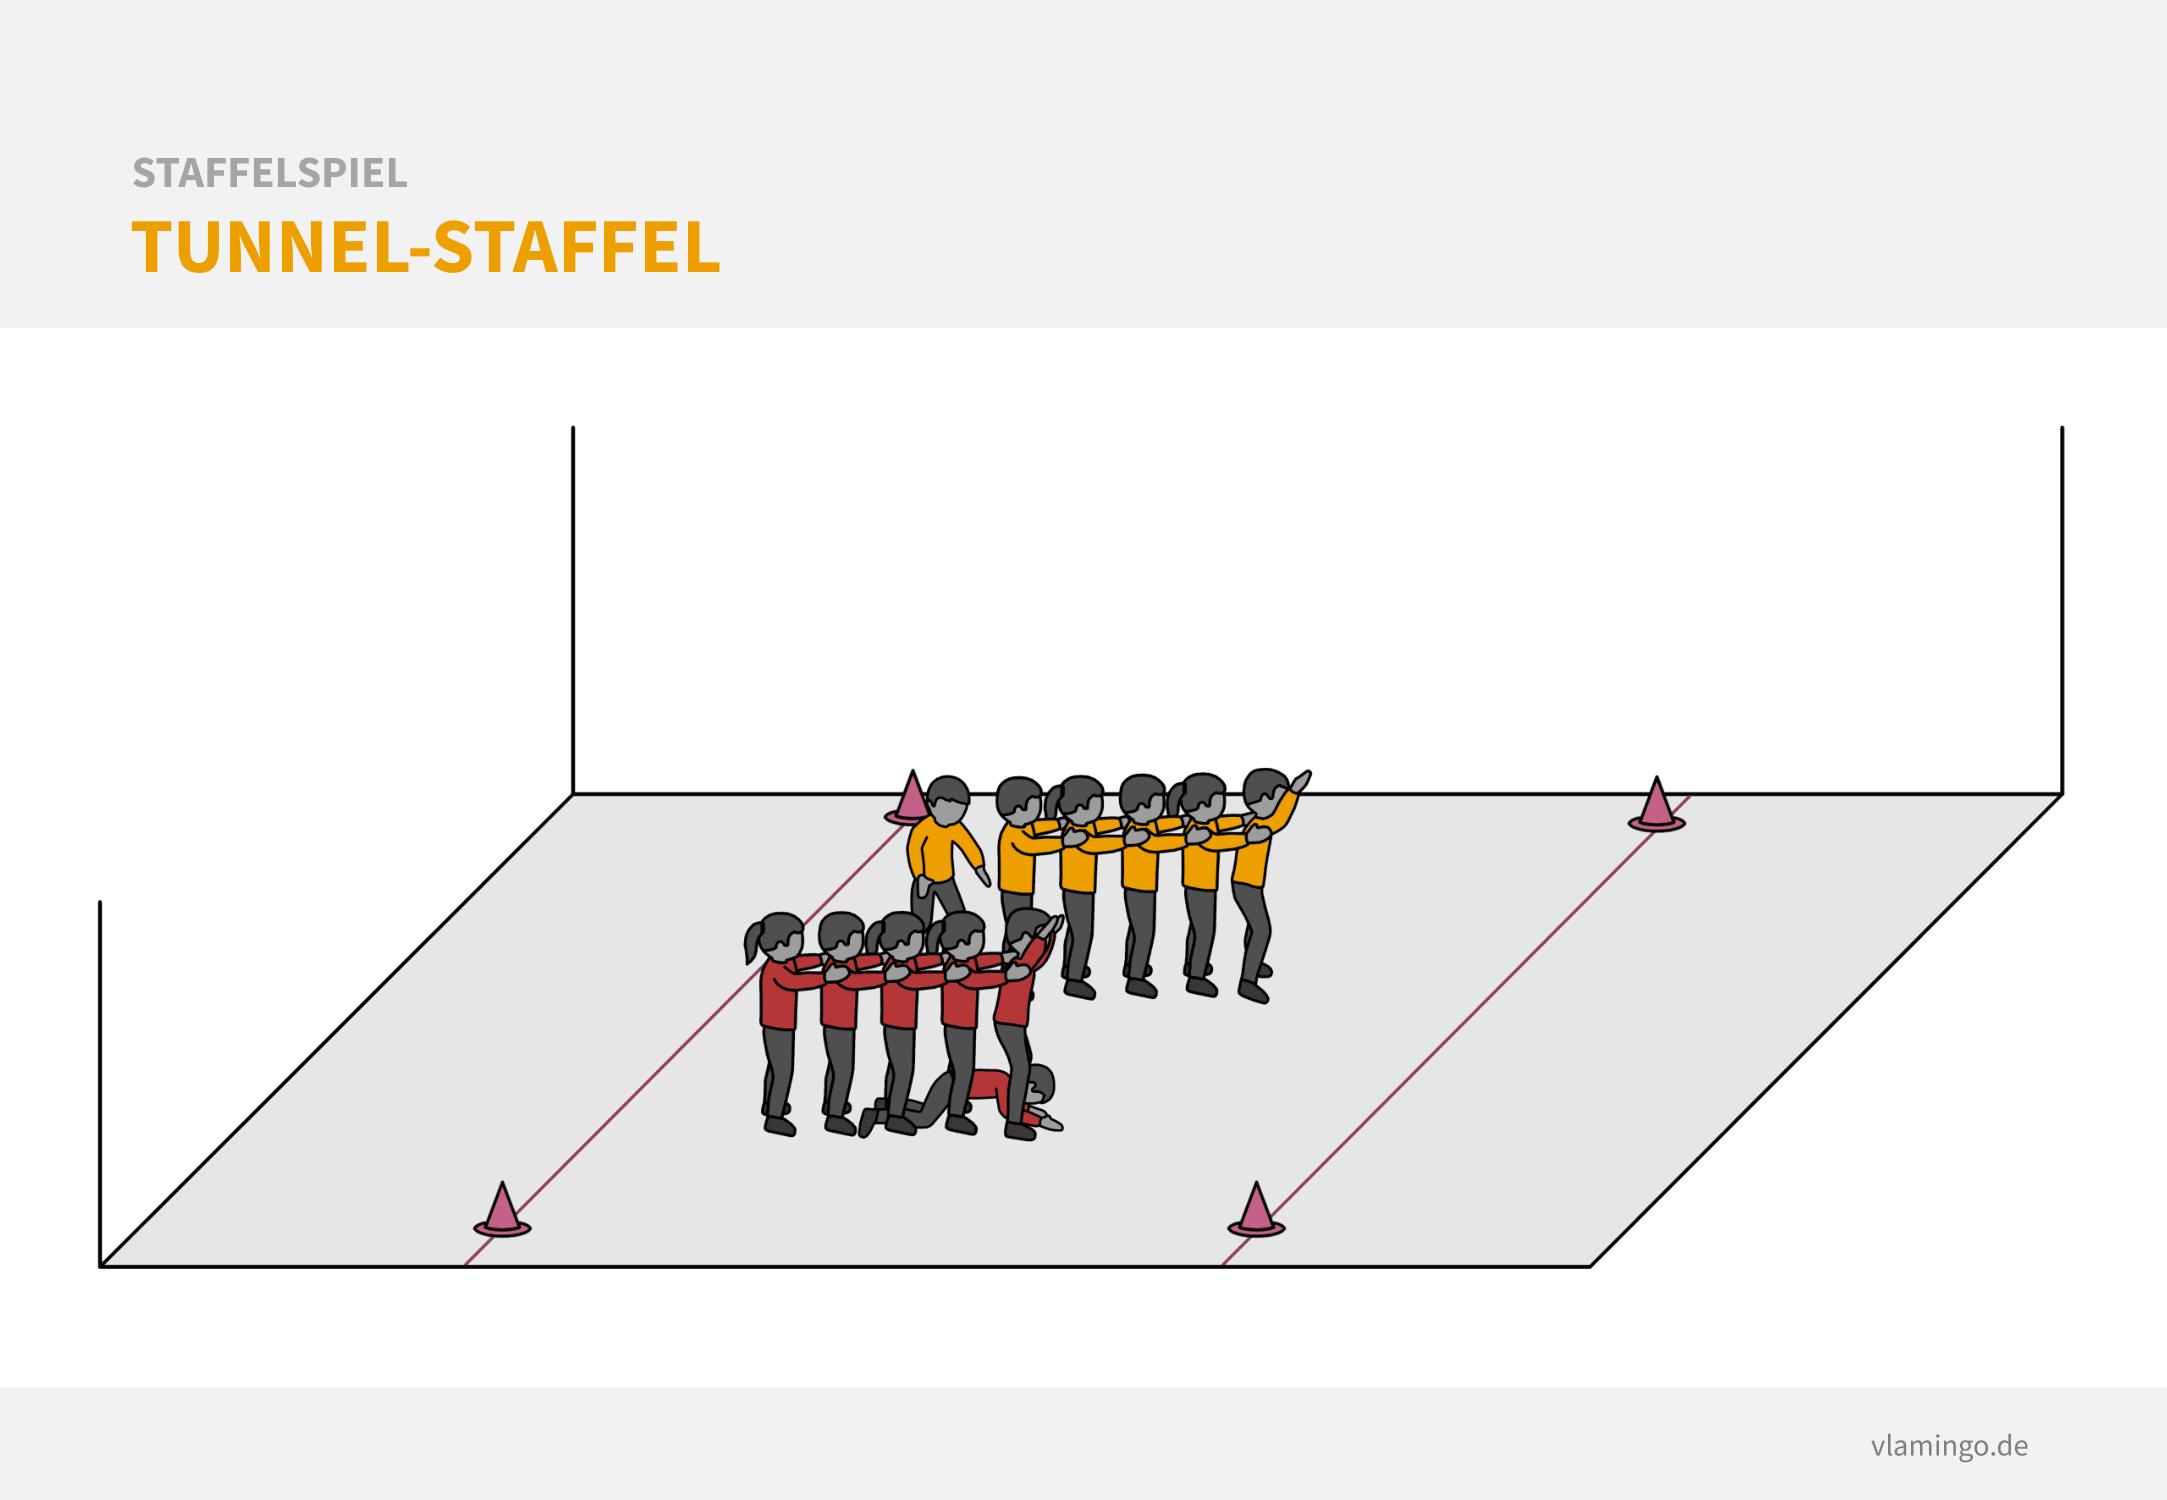 Staffelspiel - Tunnel-Staffel